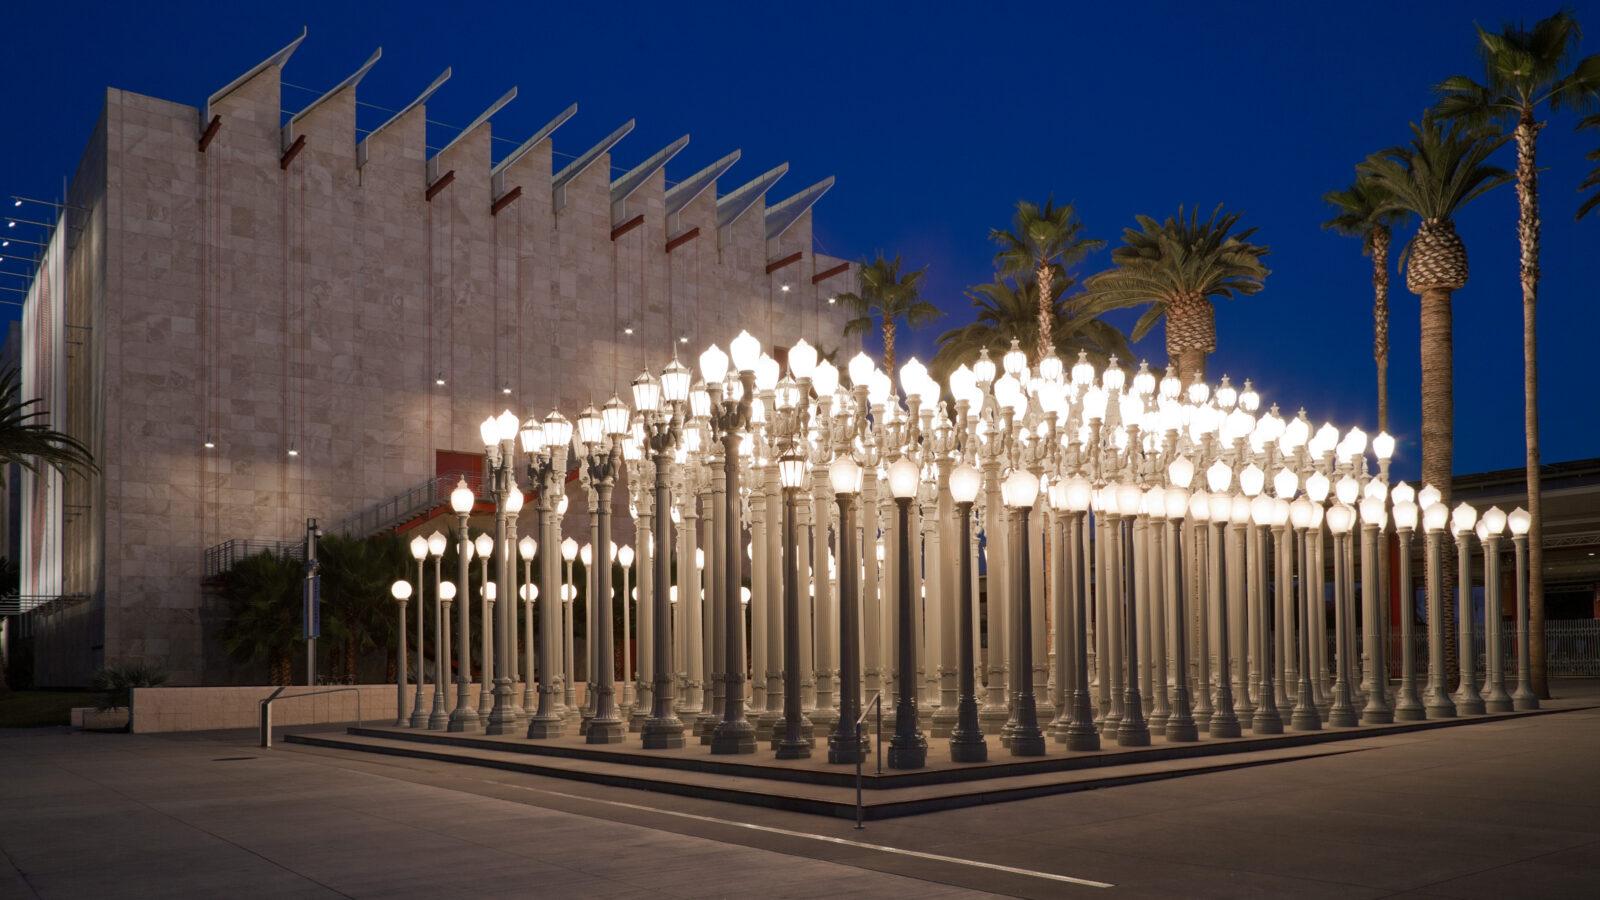 Illuminated light posts on display